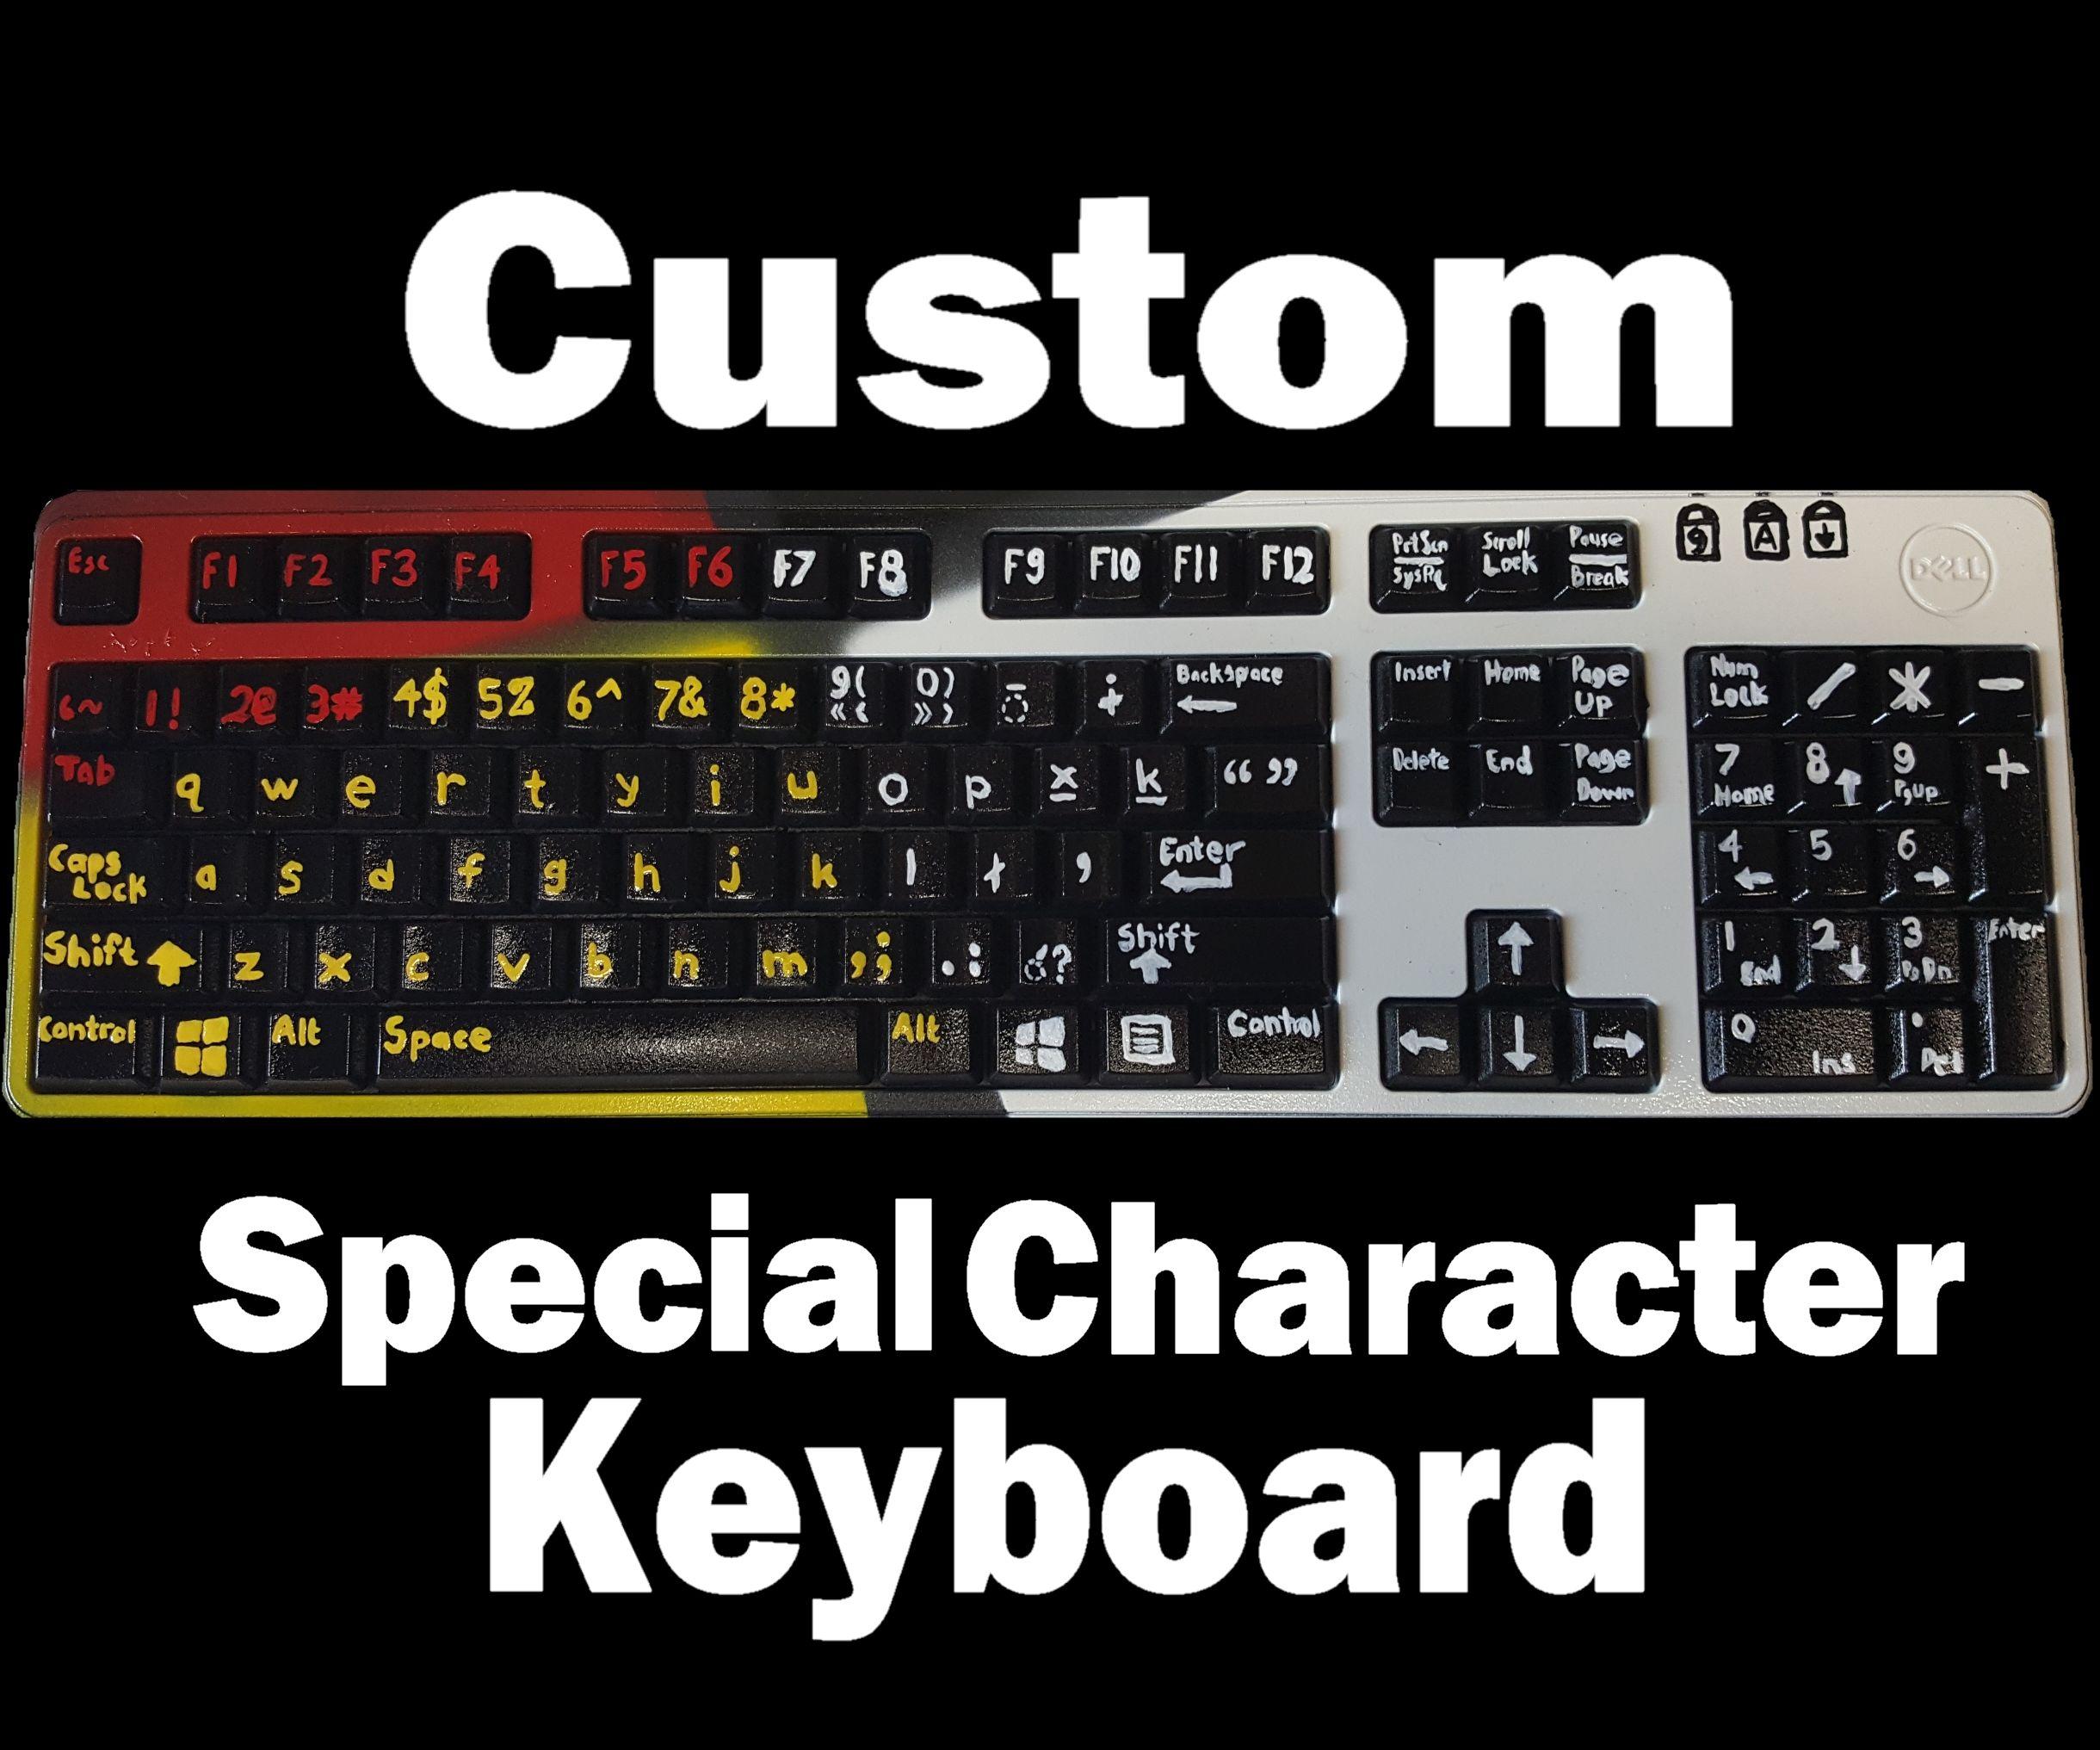 Custom Special Character Keyboard